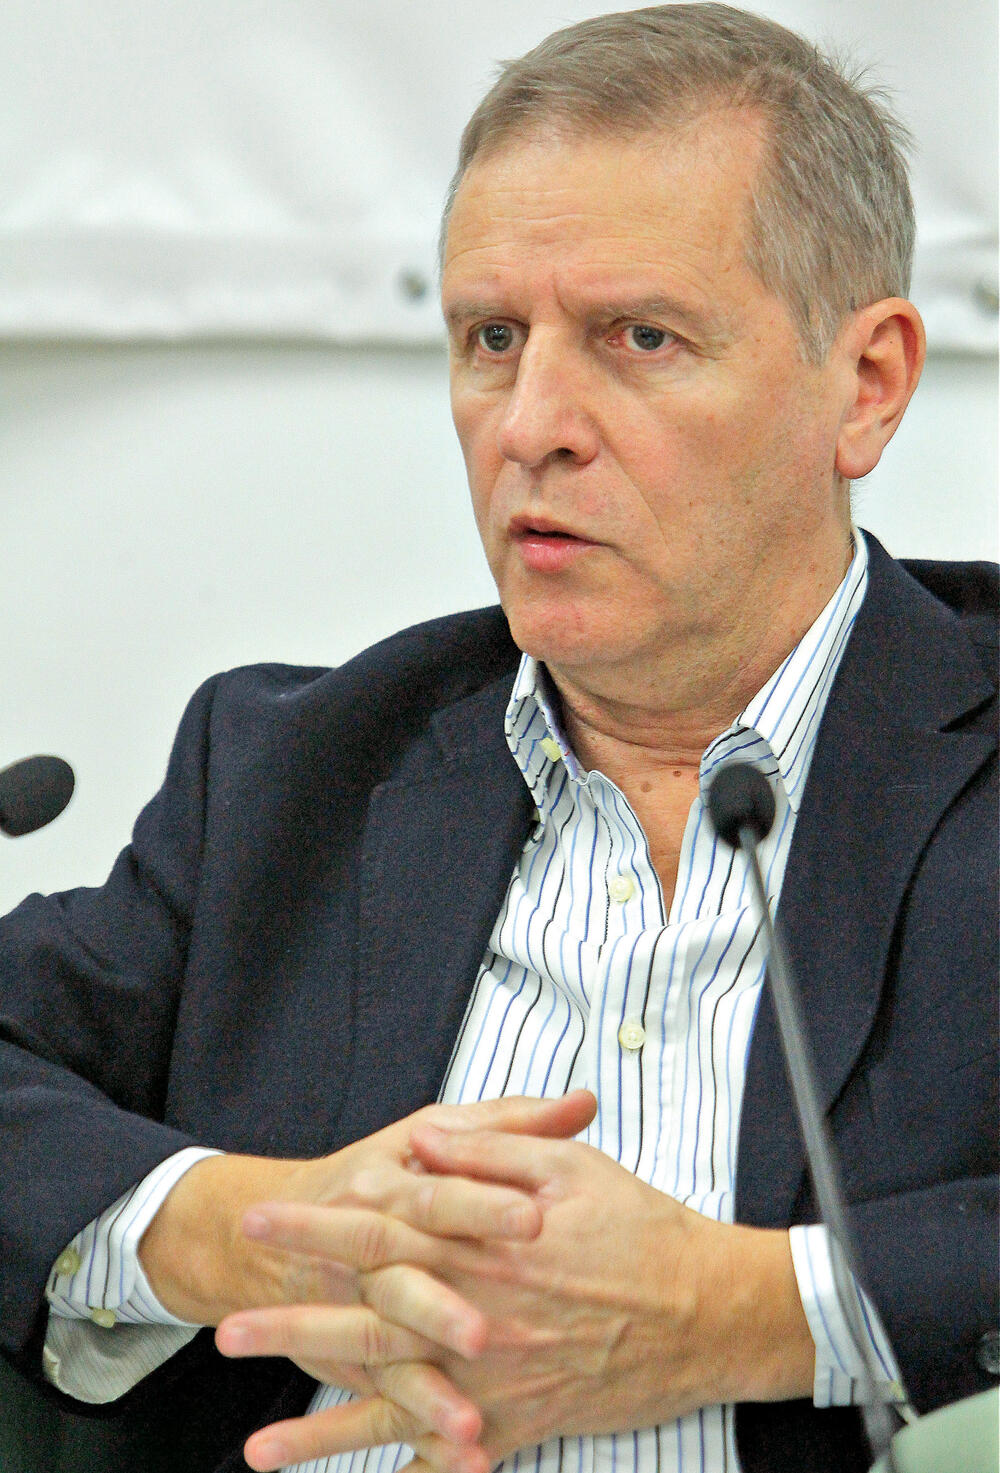 Milisav Paić